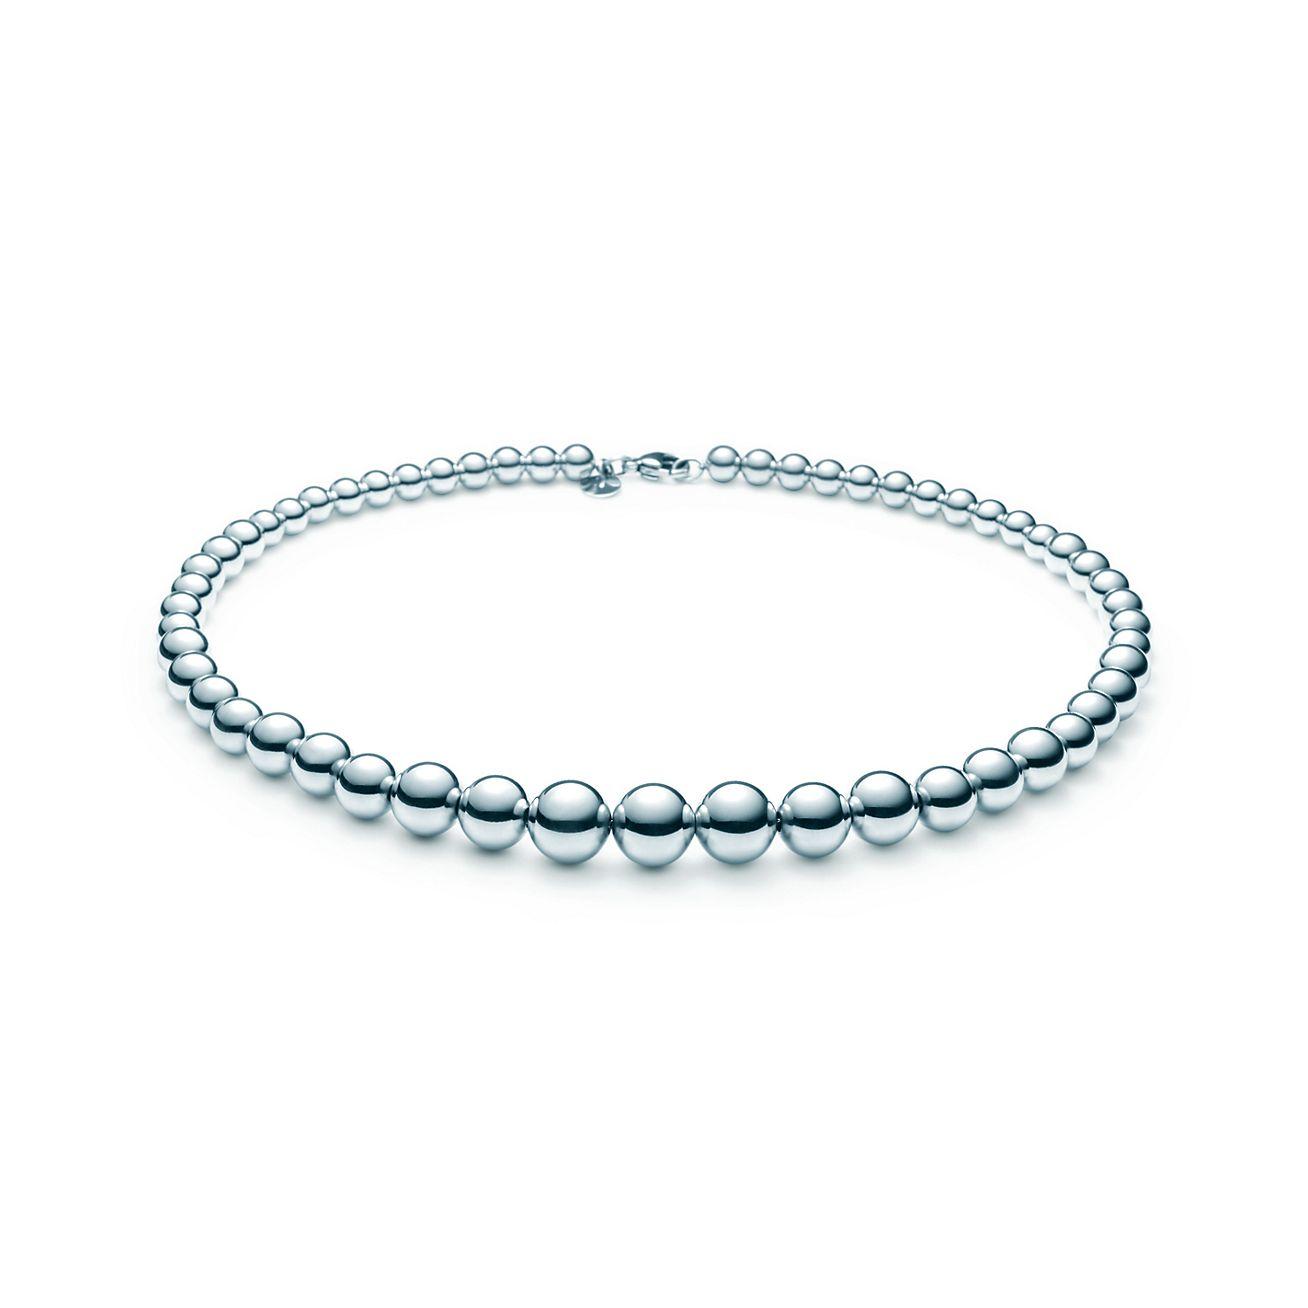 Tiffanys Wedding Rings 018 - Tiffanys Wedding Rings